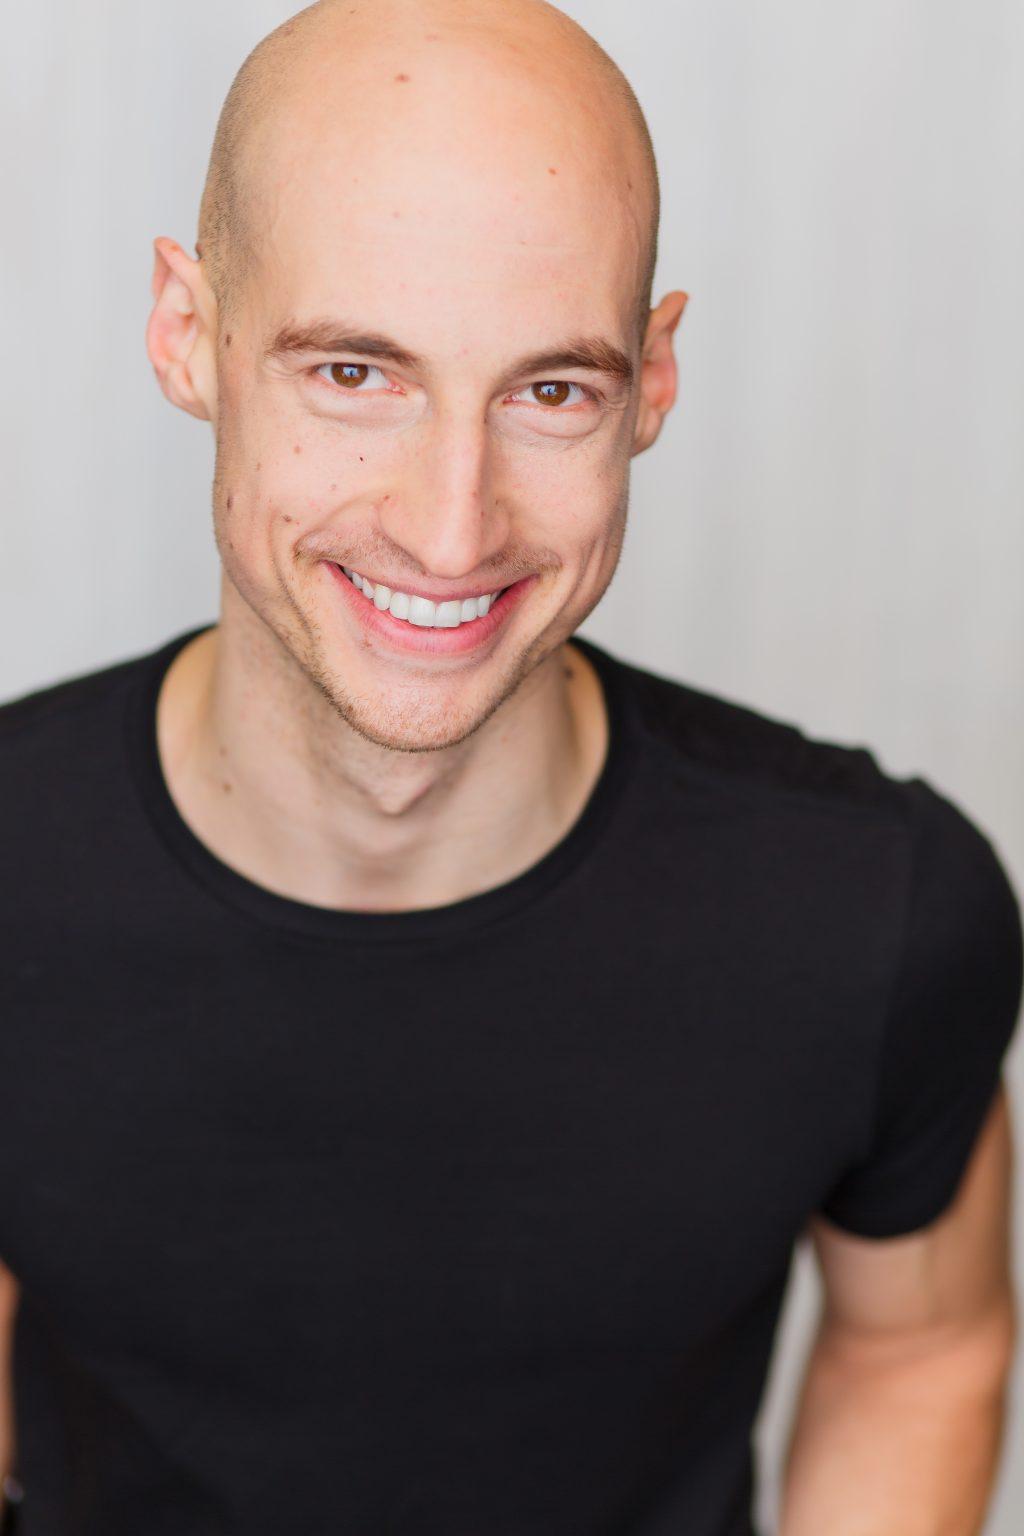 Personal Trainer Chicago, Illinois - Jon Beal